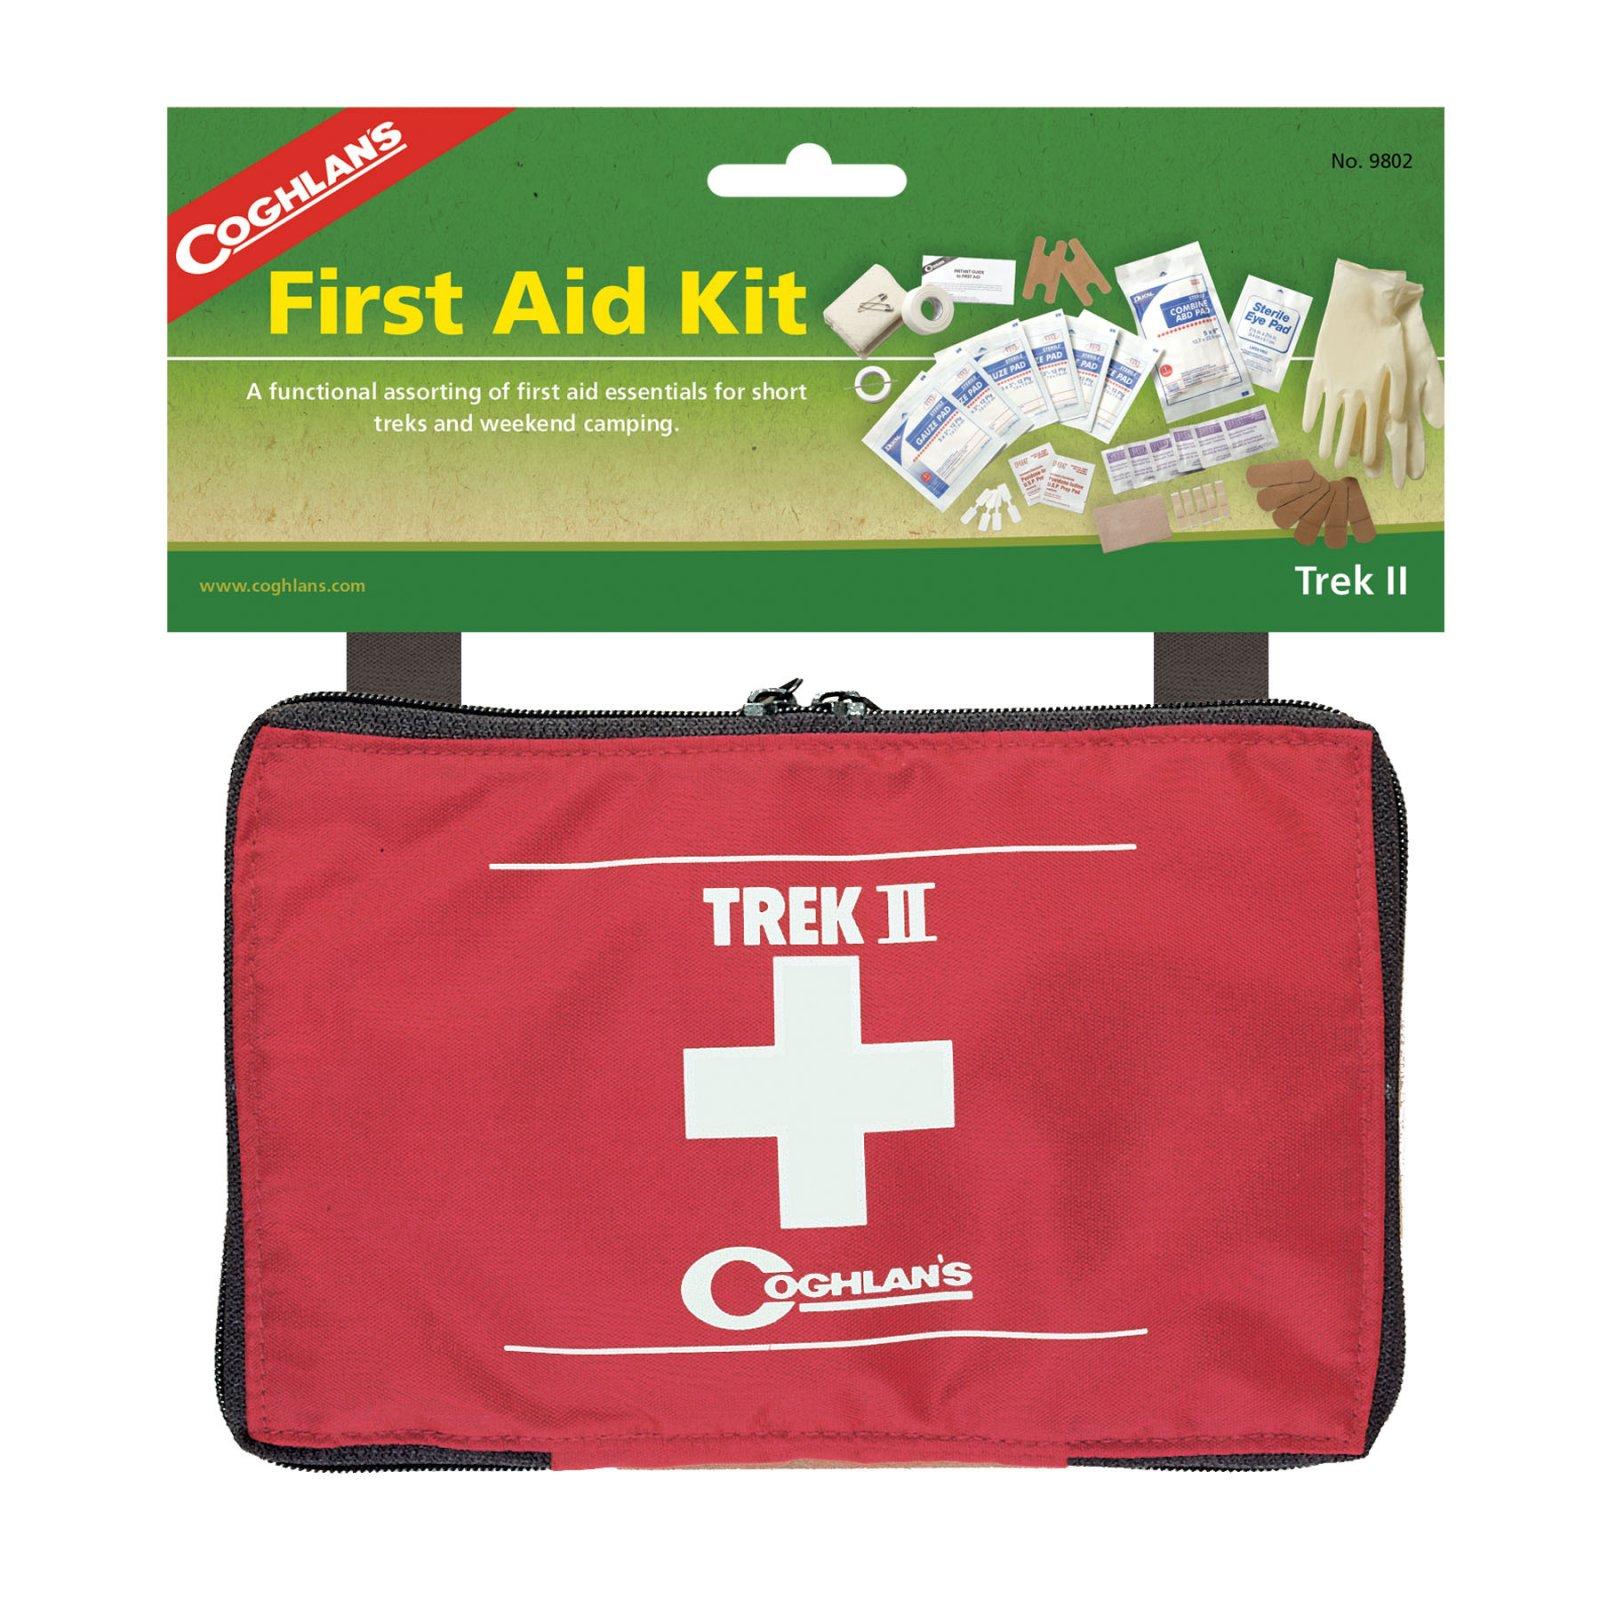 Coghlan's First Aid Kit Trek II 9802